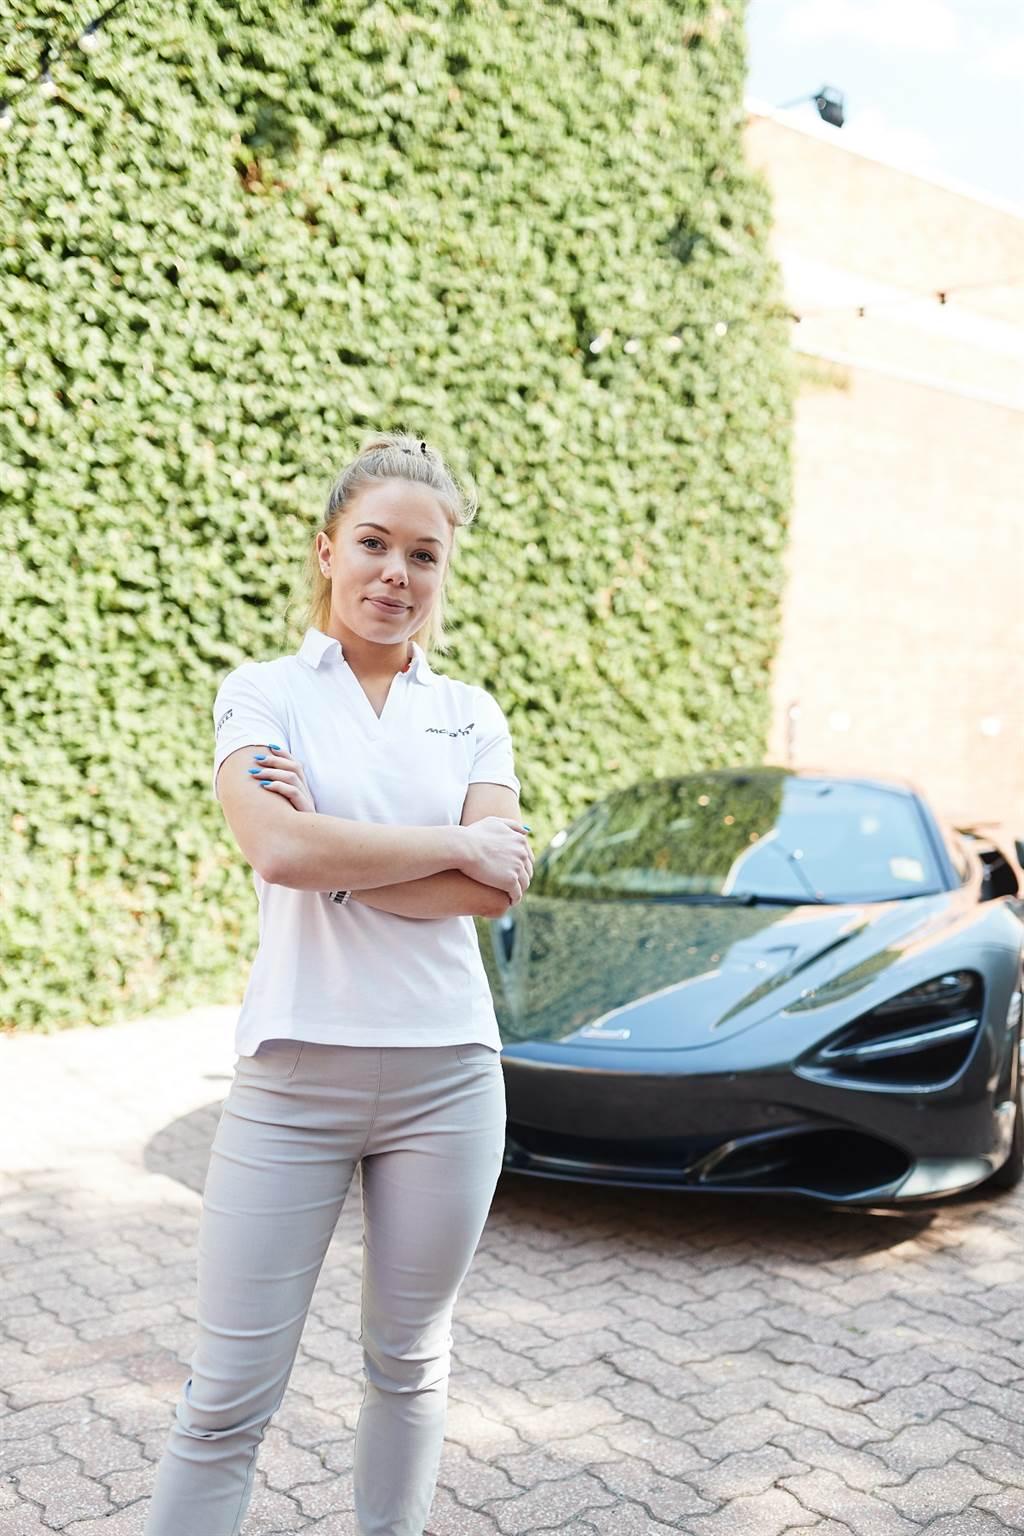 McLaren科學家獲IET國際工程技術學會頒發「年度最佳女工程師」獎項